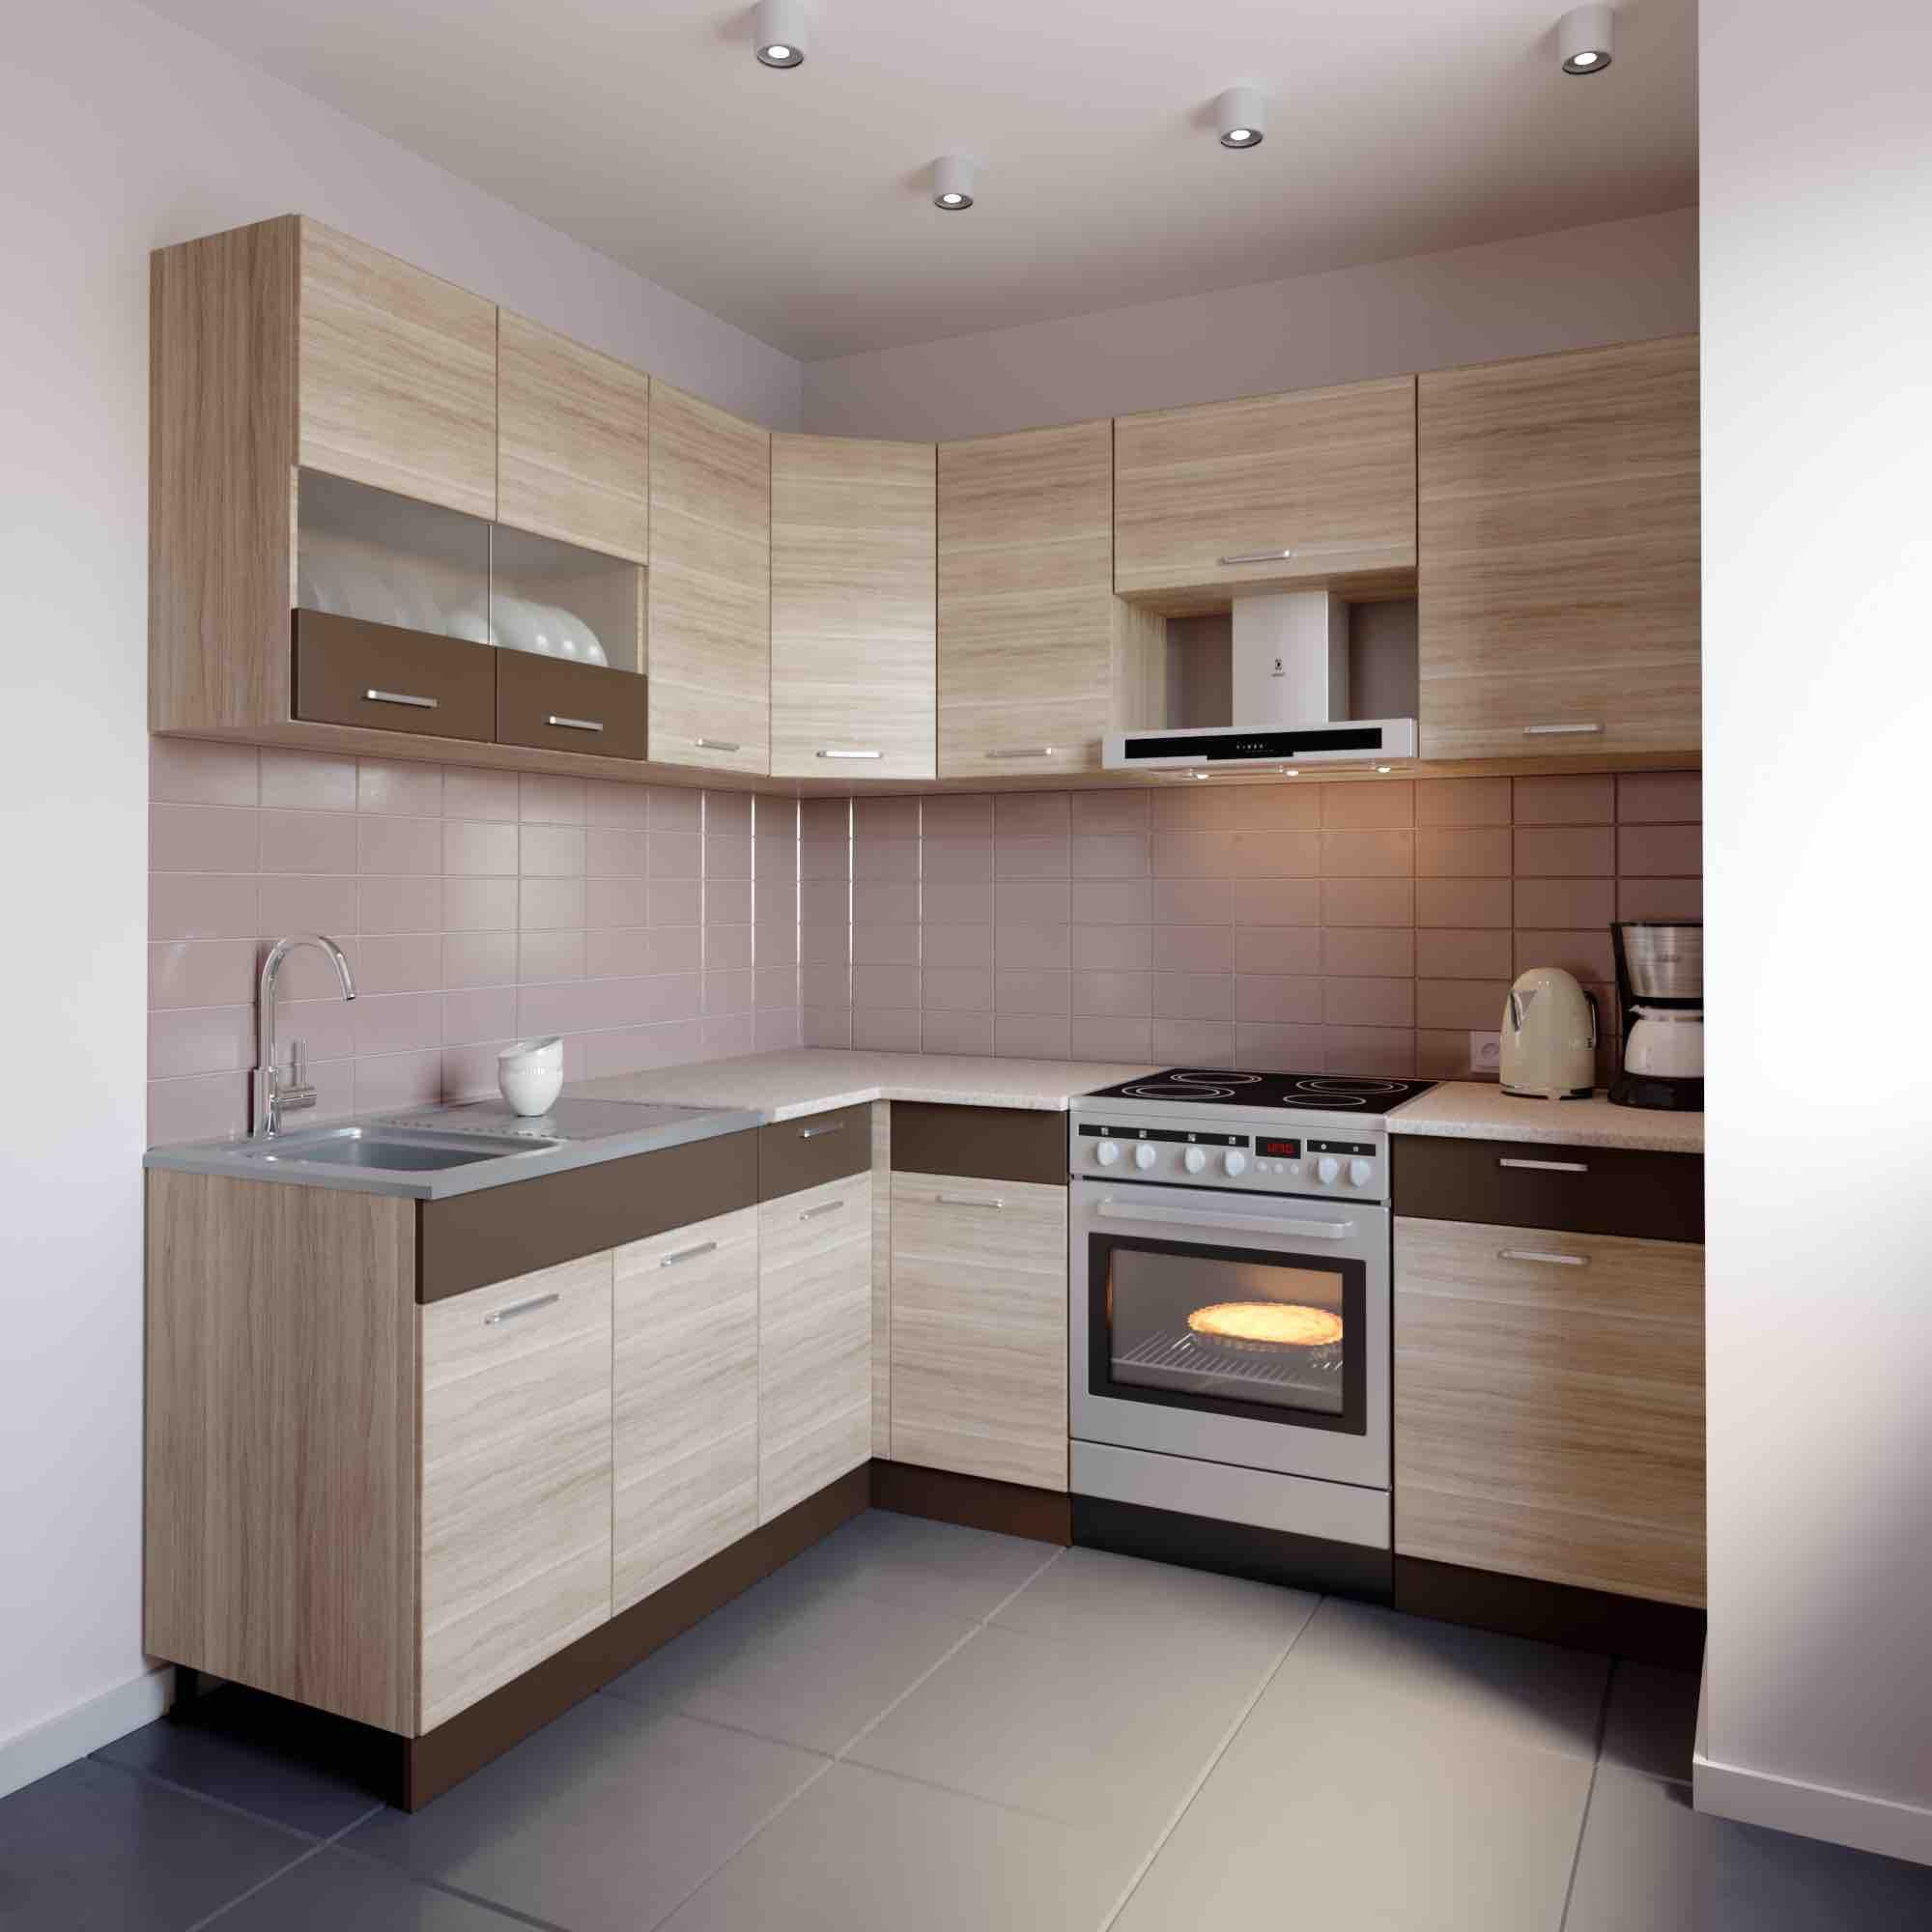 Küche L-Form ALINA 180x210 cm